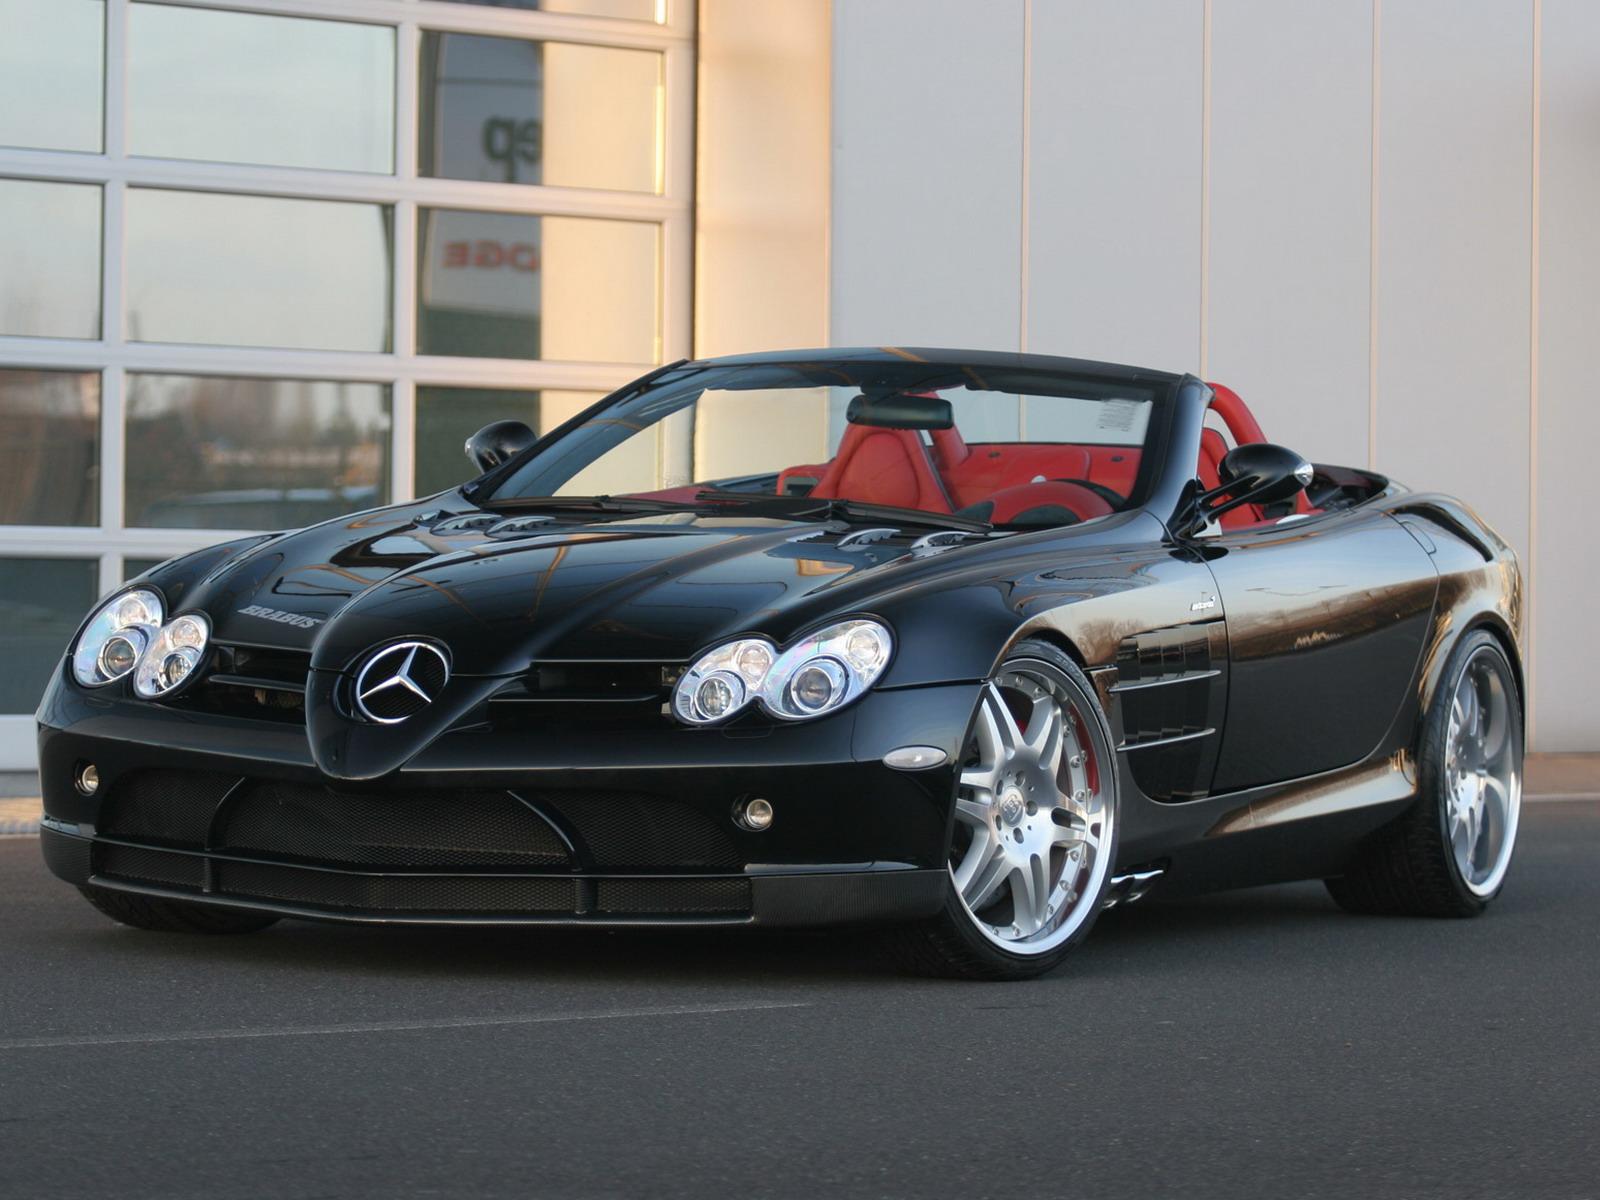 Mercedes Benz Slr Mclaren Black Convertible Mercedes Benz SLR McLa...